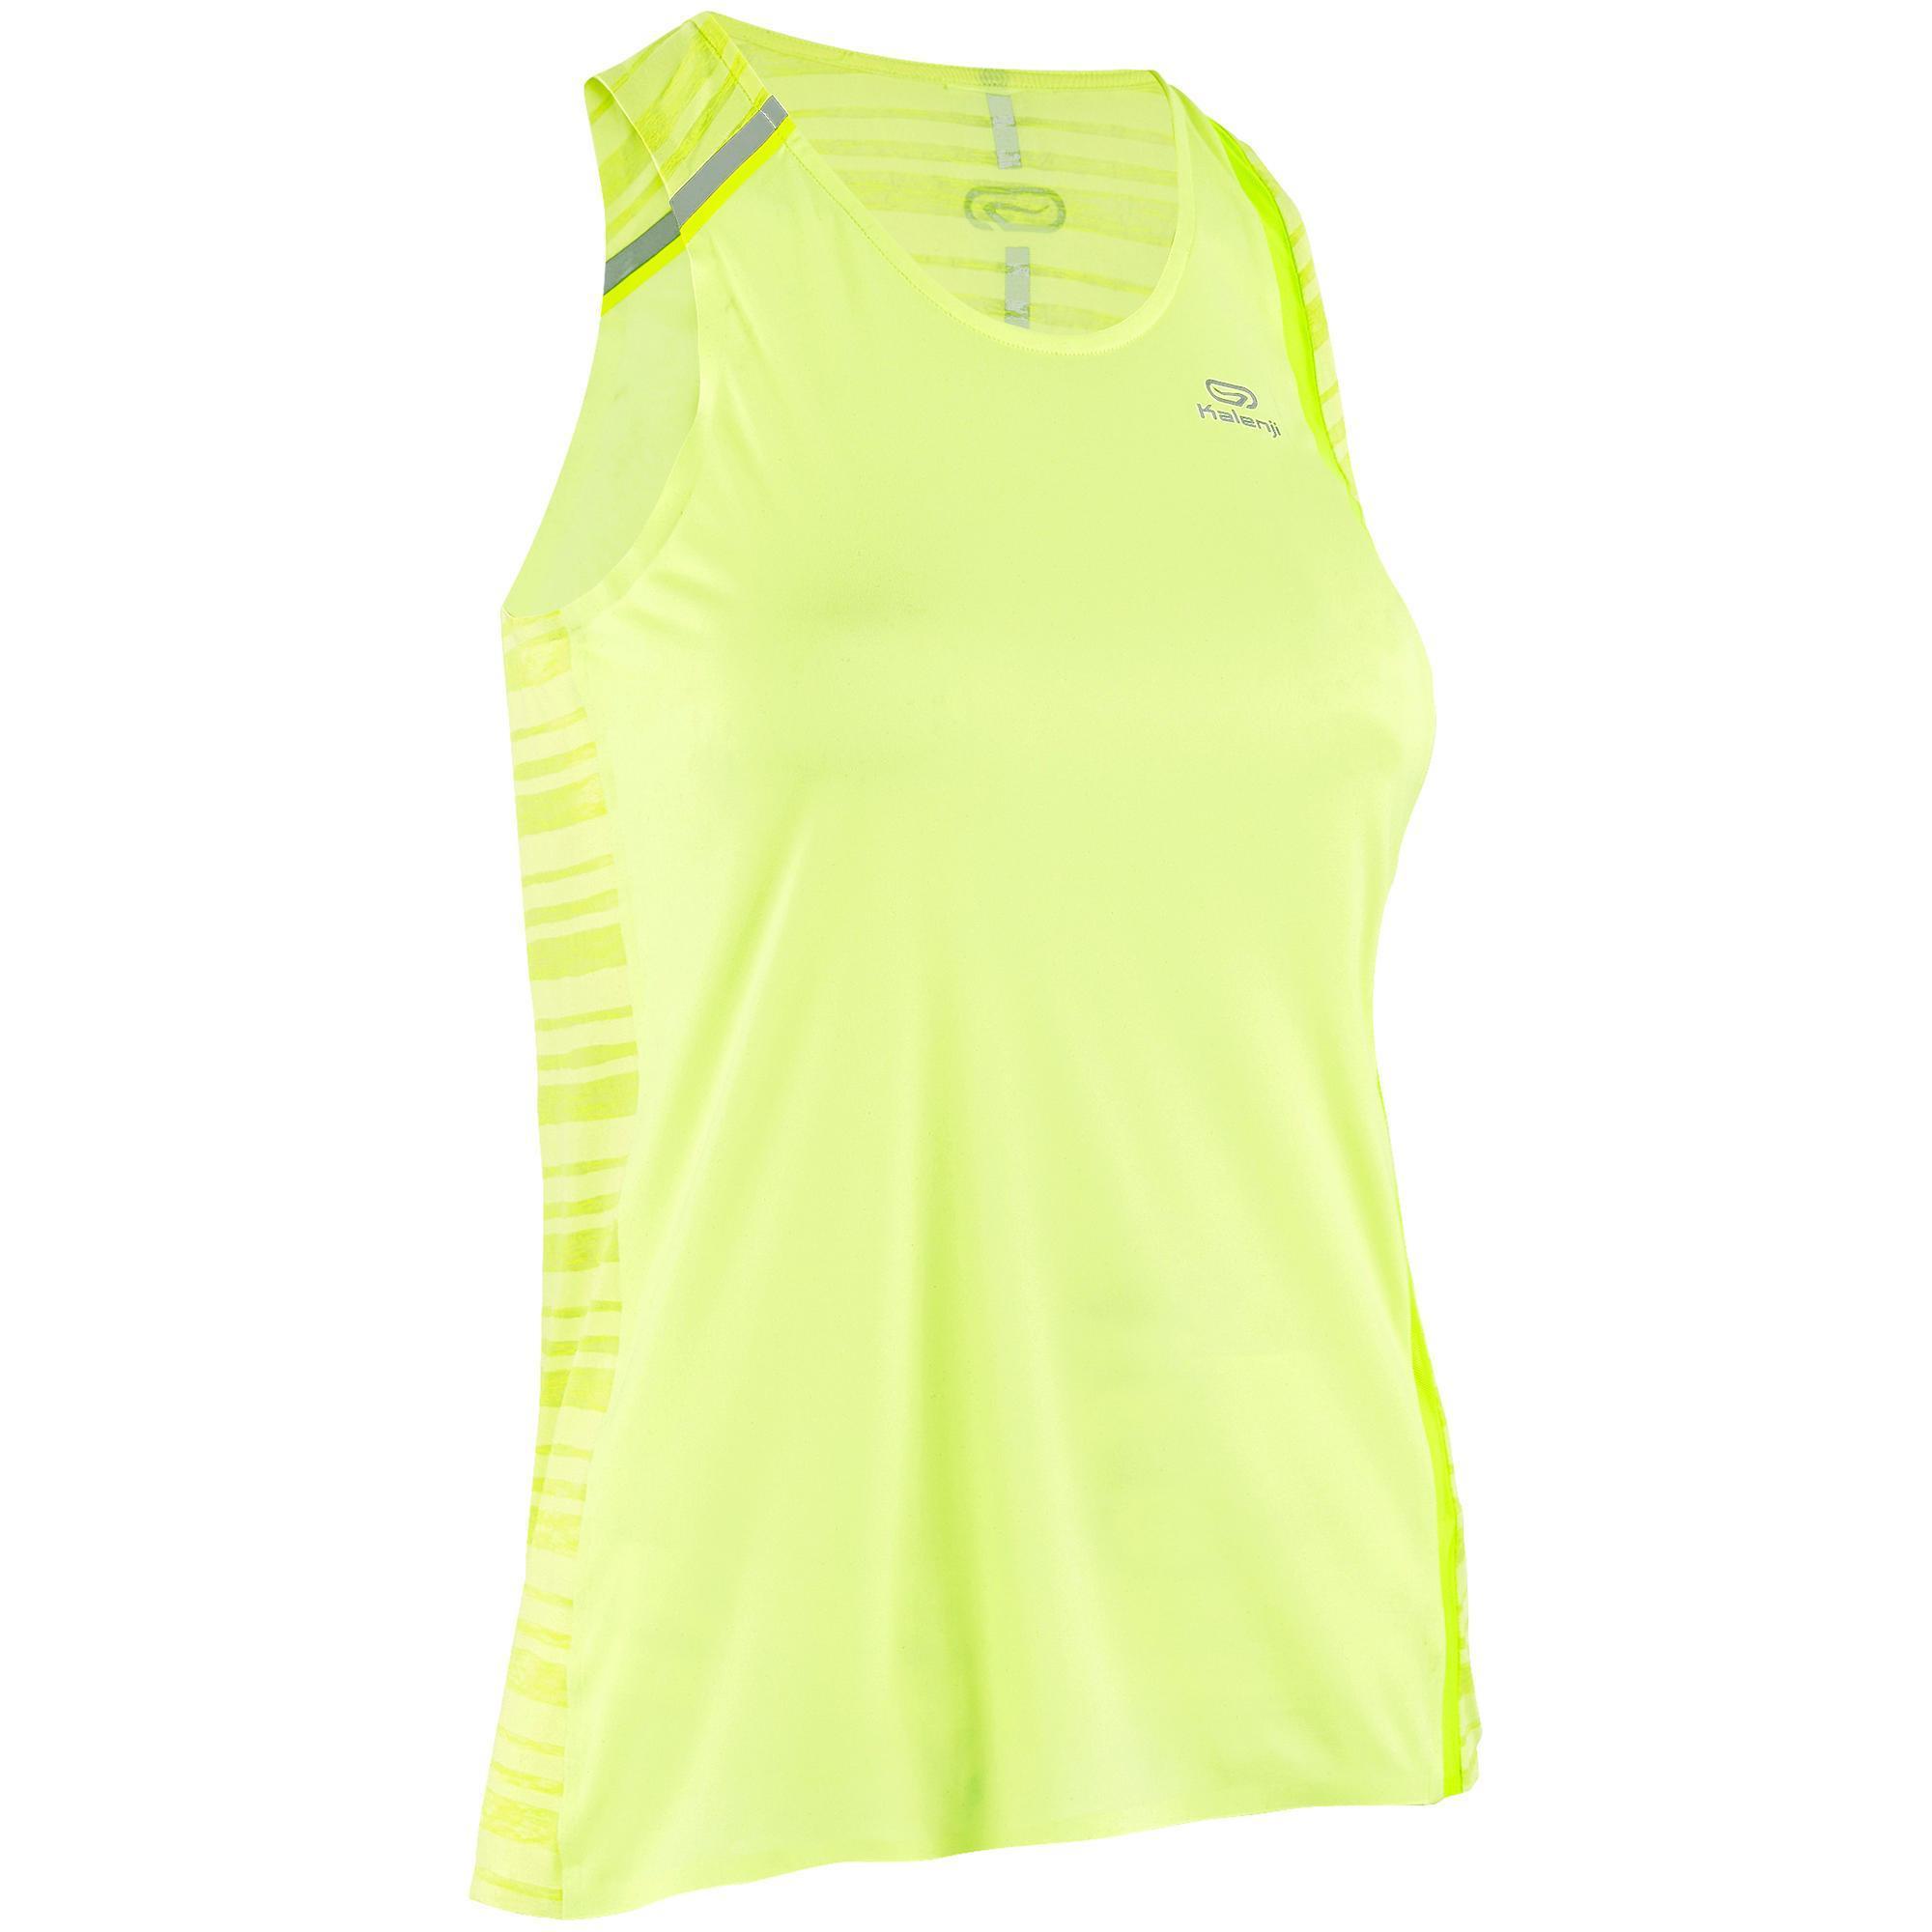 DÉbardeur running femme kiprun light jaune kalenji